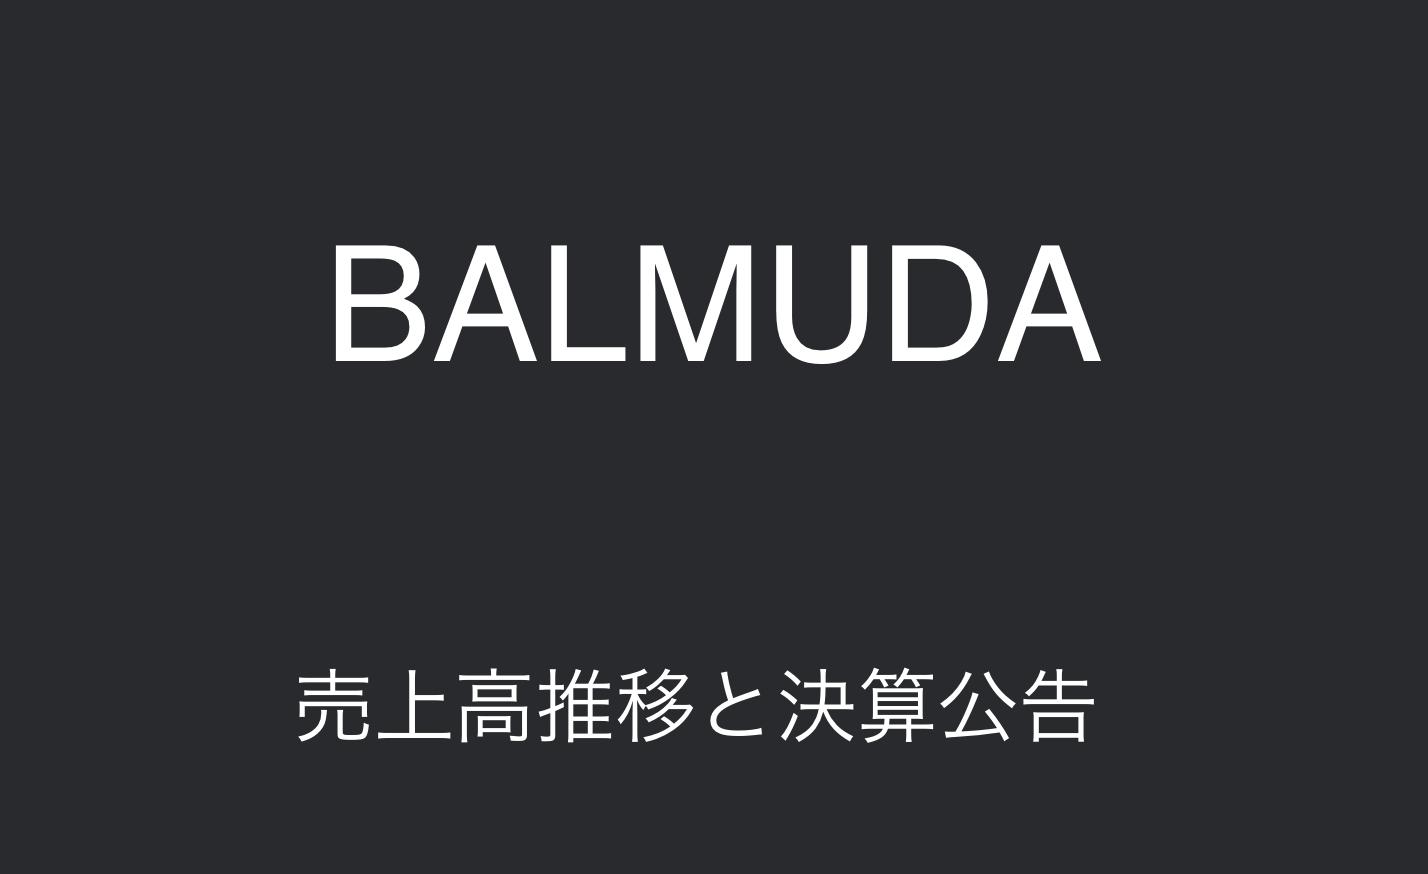 BALMUDA(バルミューダ)売上高推移と決算公告(利益)が個人的に話題に